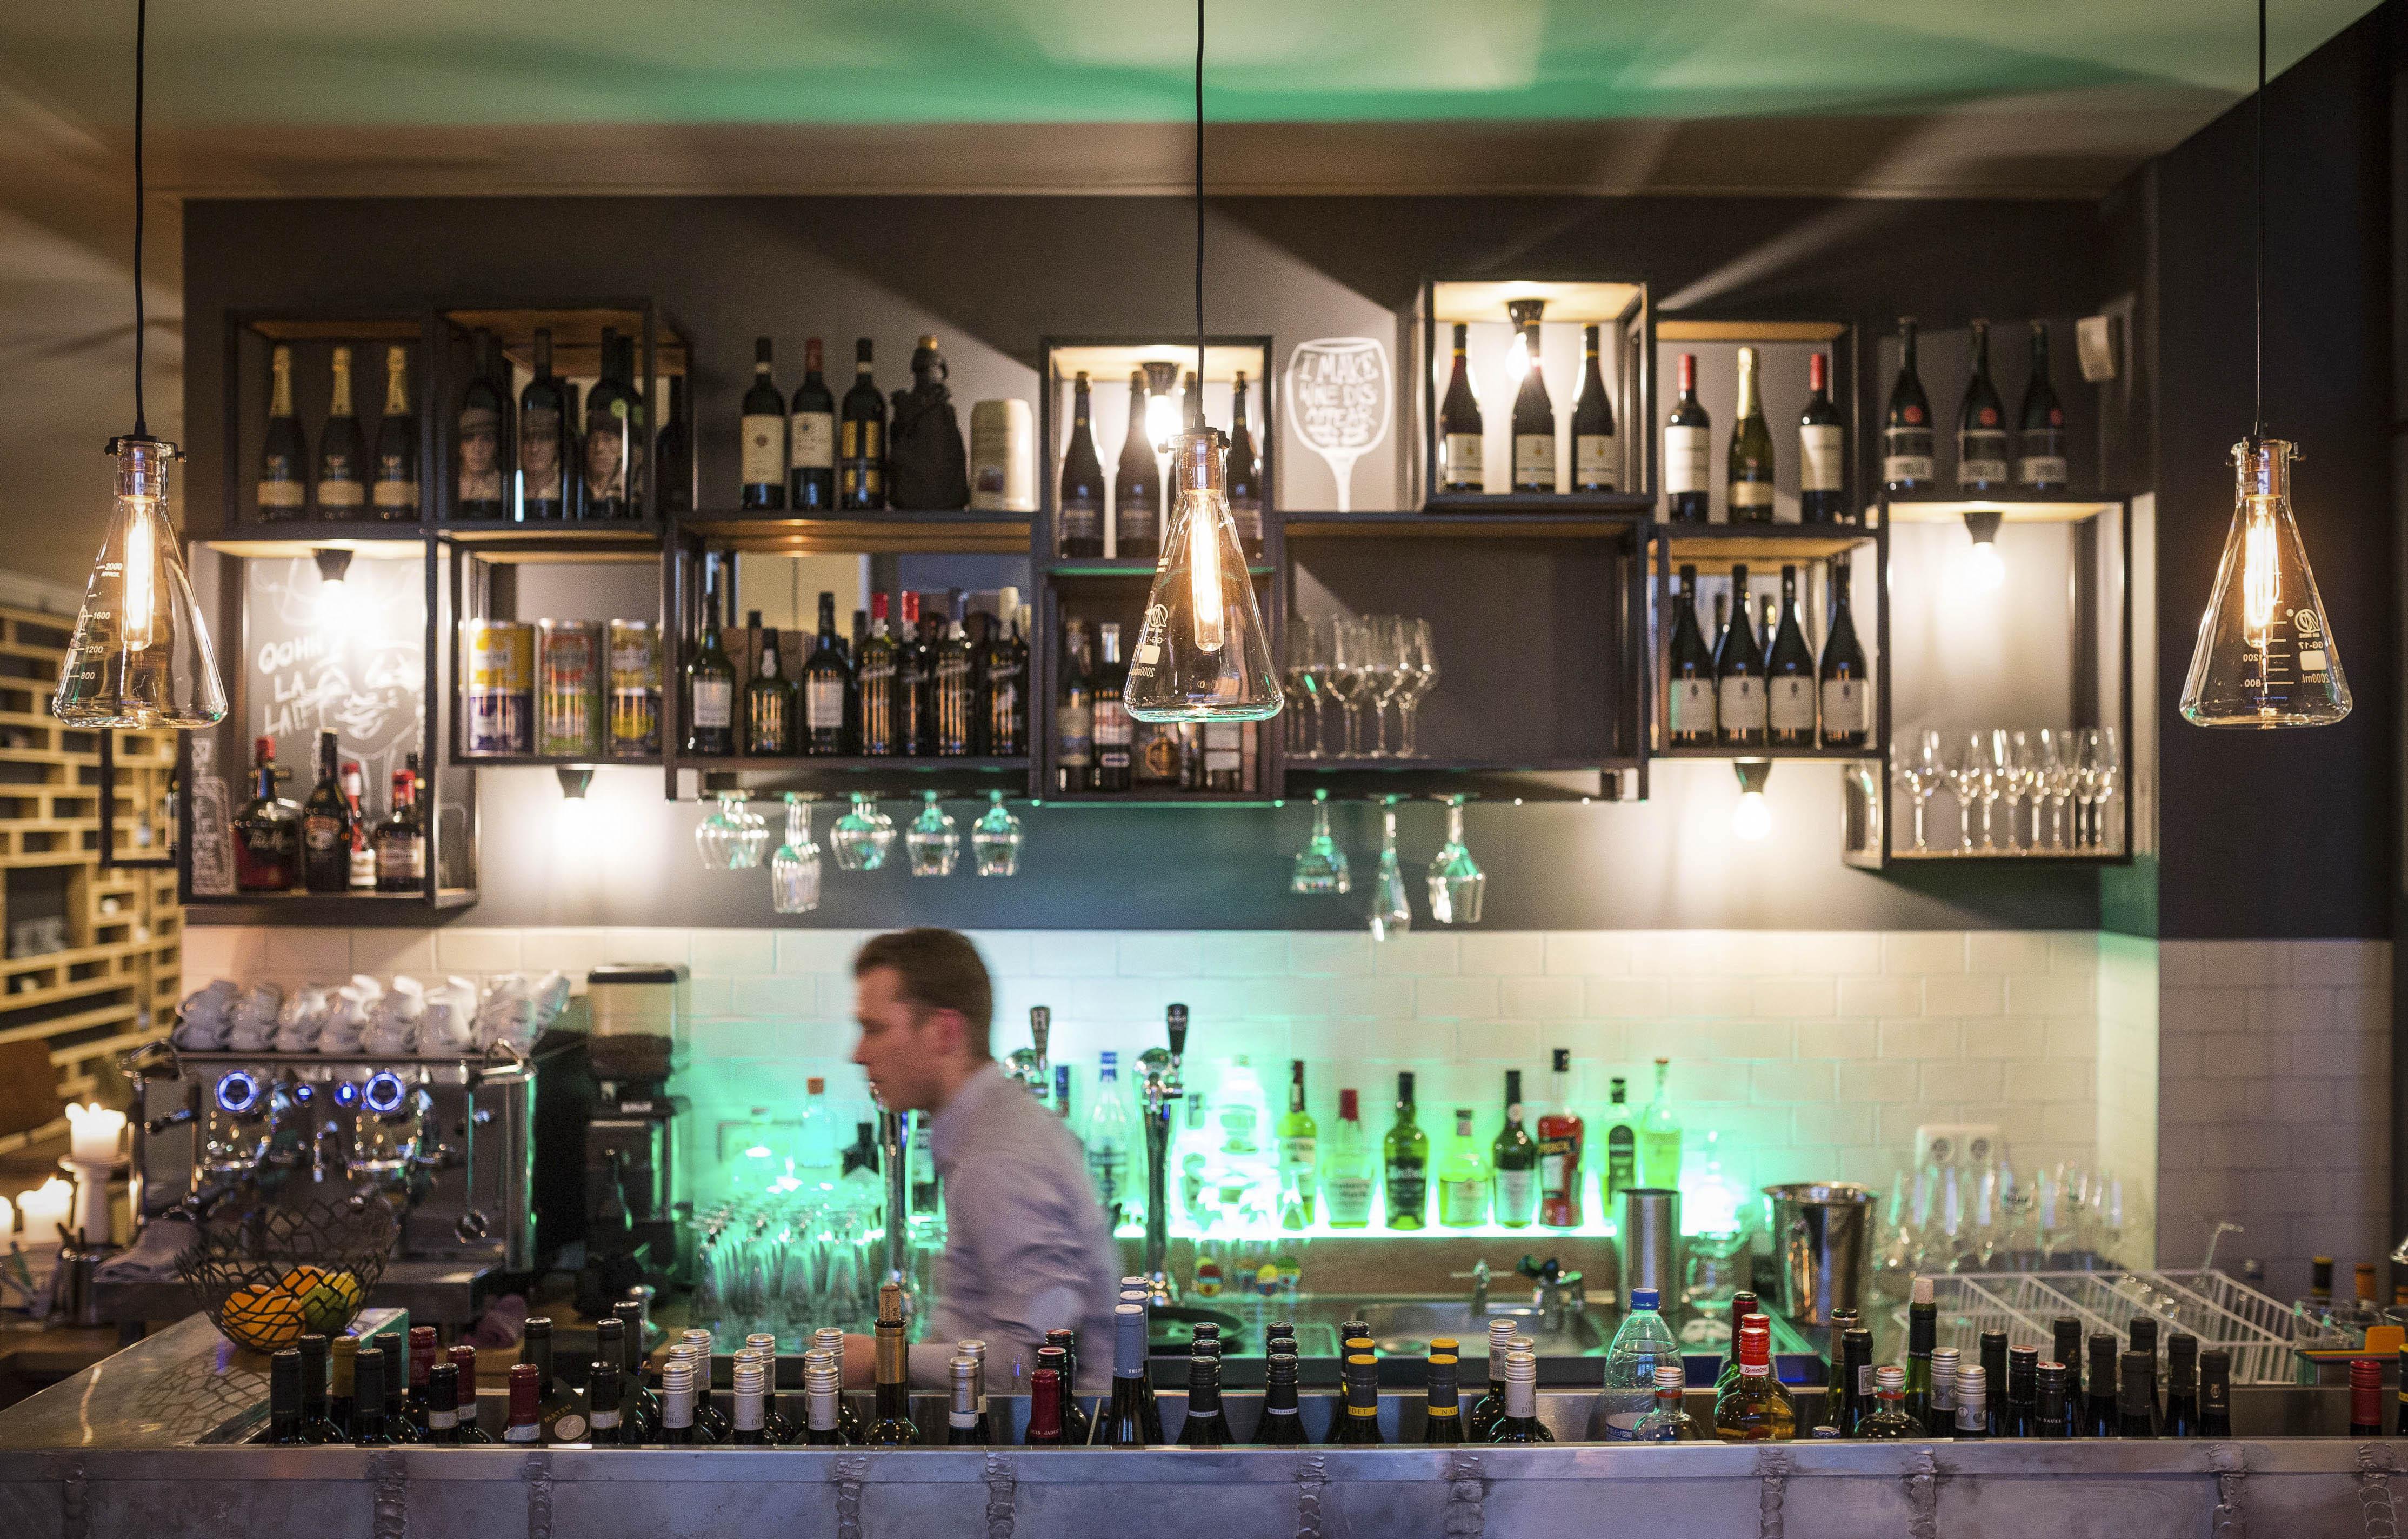 A work by Does - 13 Digital Does Zinc Restaurant_ Blickfänger 13-smaller